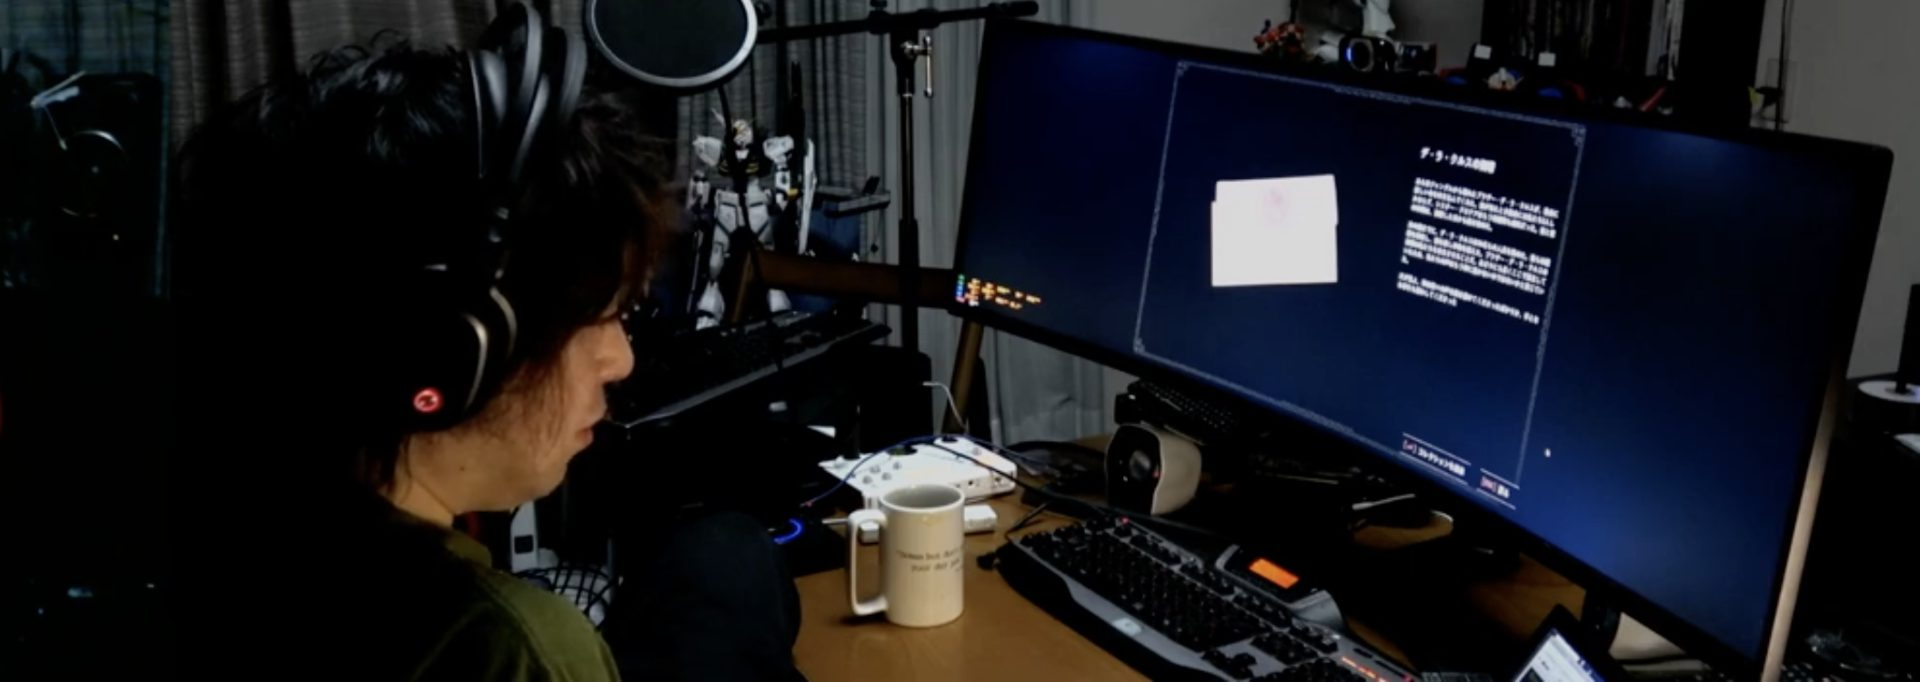 l koya zenji - 西川善司「MSはなんでハード作ってるか理解できない。任天堂もそうだけどほんと謎」